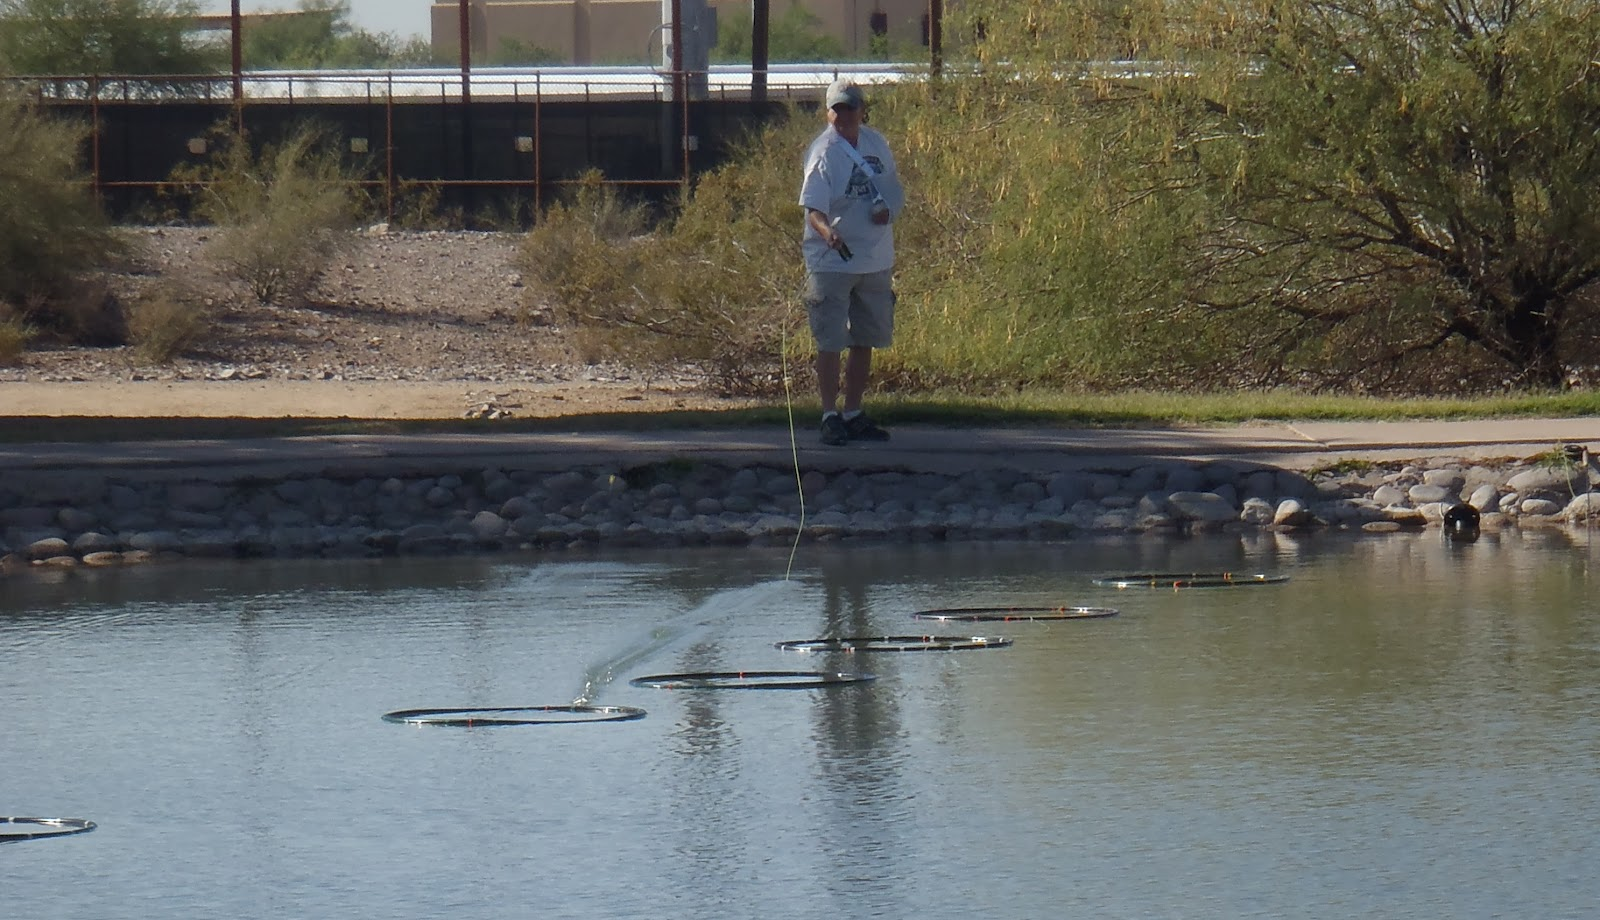 Phoenix fly casters fly fishing arizona rio salado for Fishing in phoenix arizona